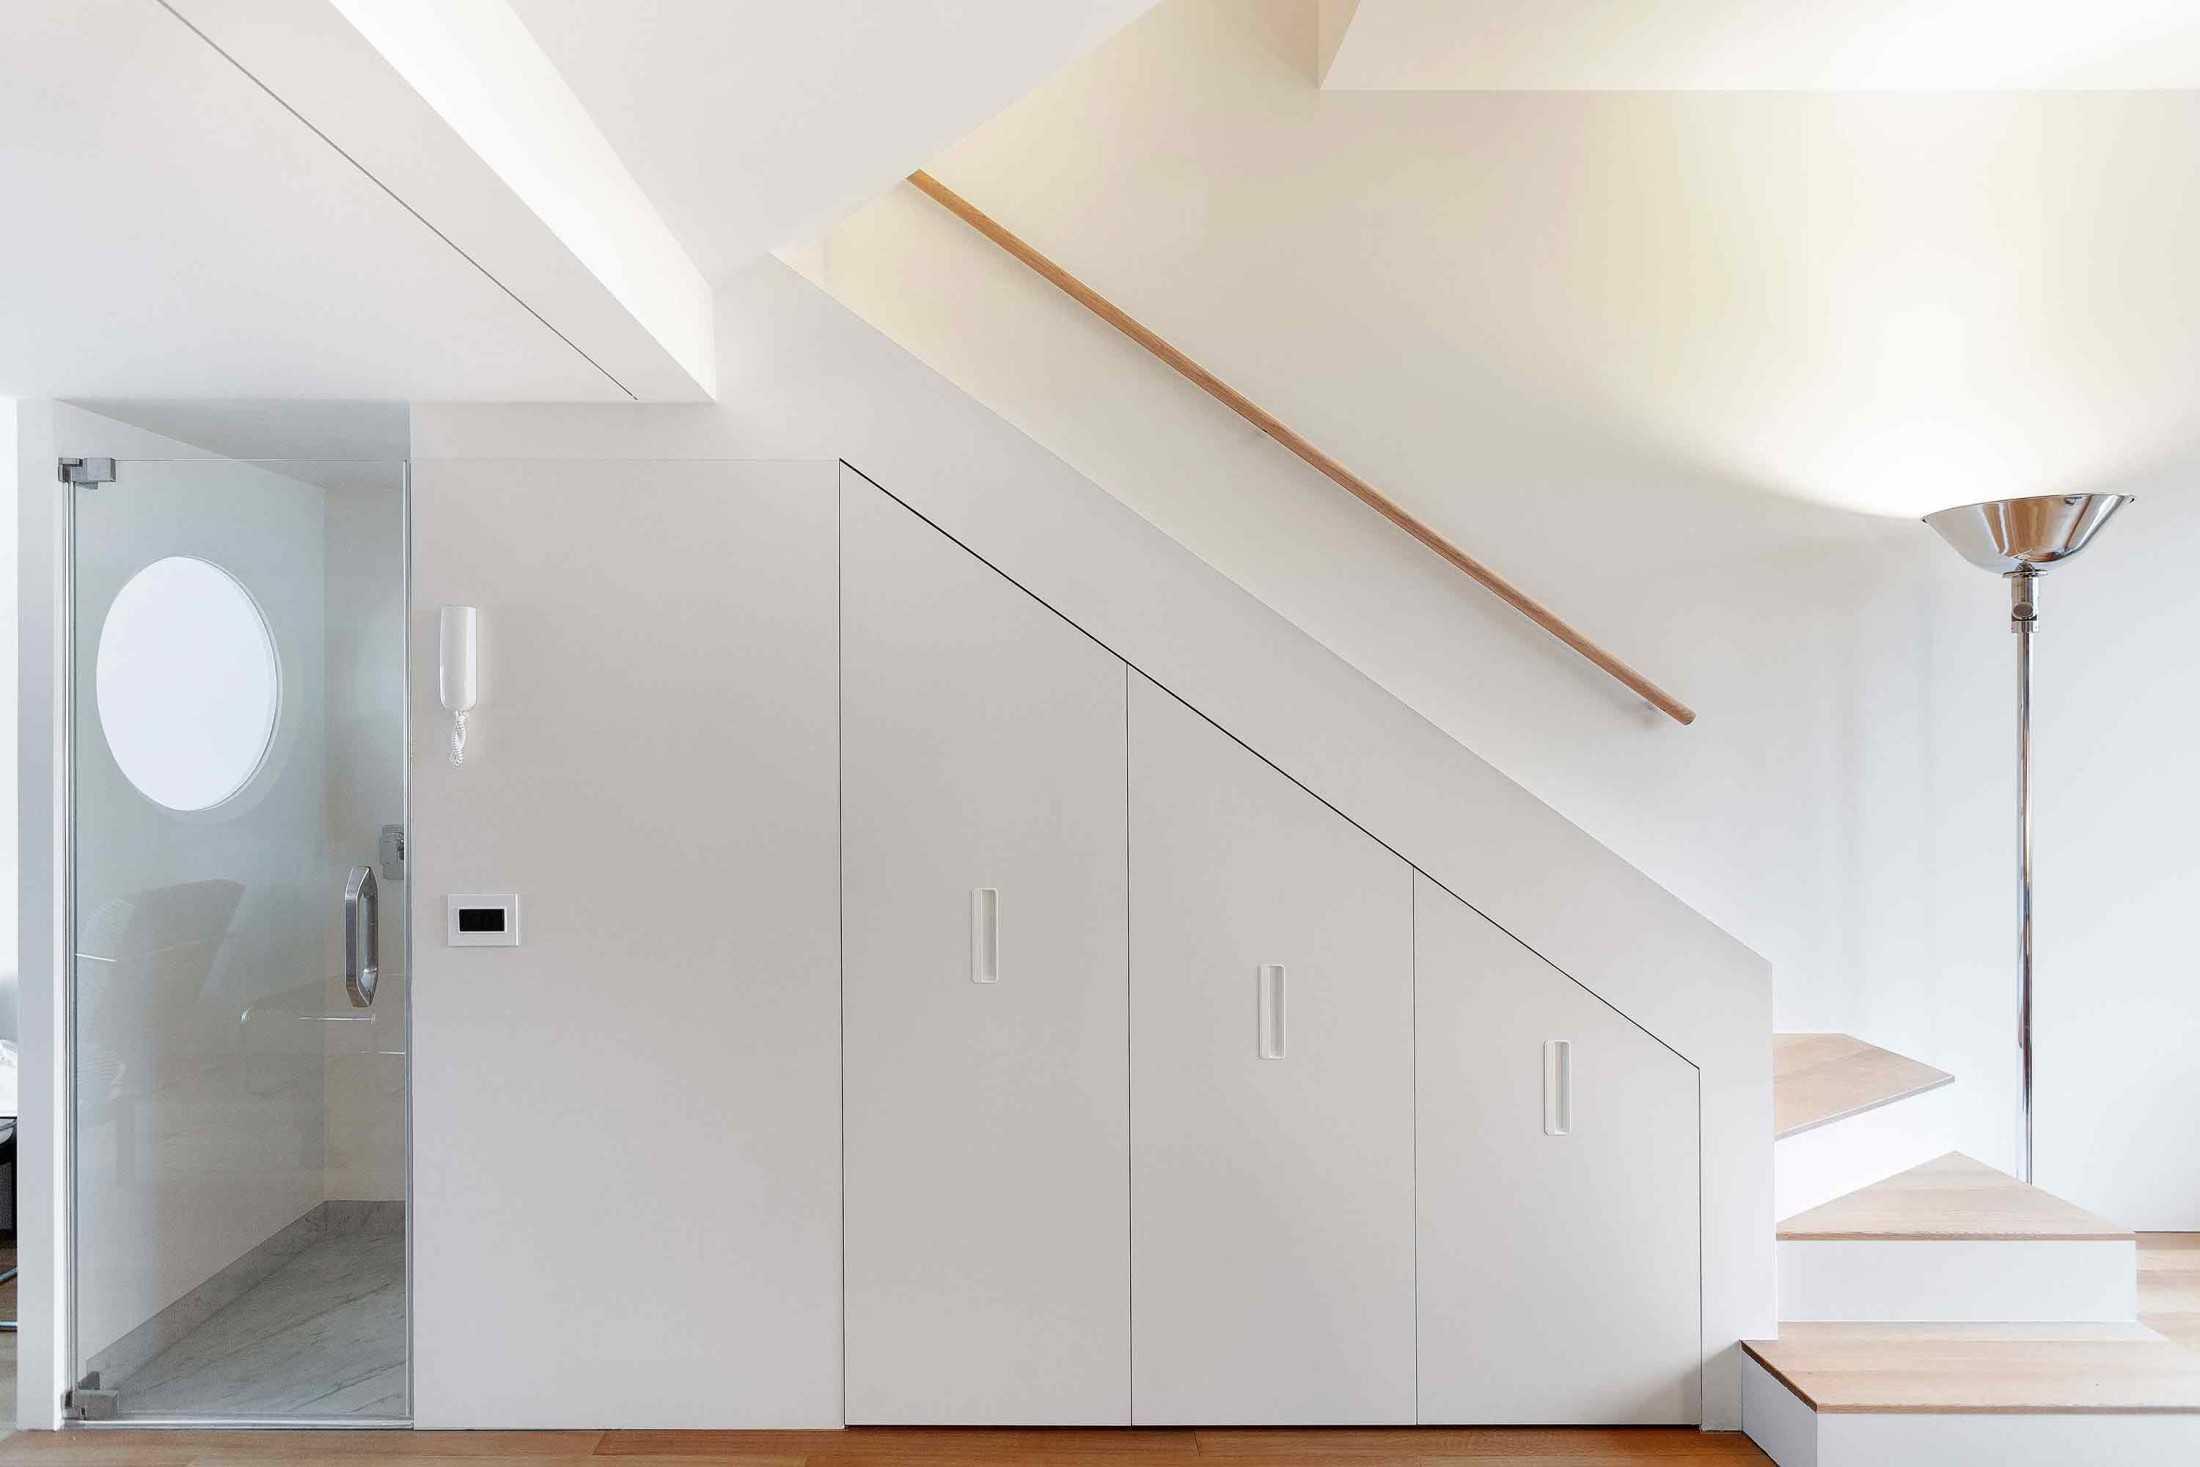 Penempatan kamar mandi mungil di bawah tangga karya studio Bazi, via organized-home.com